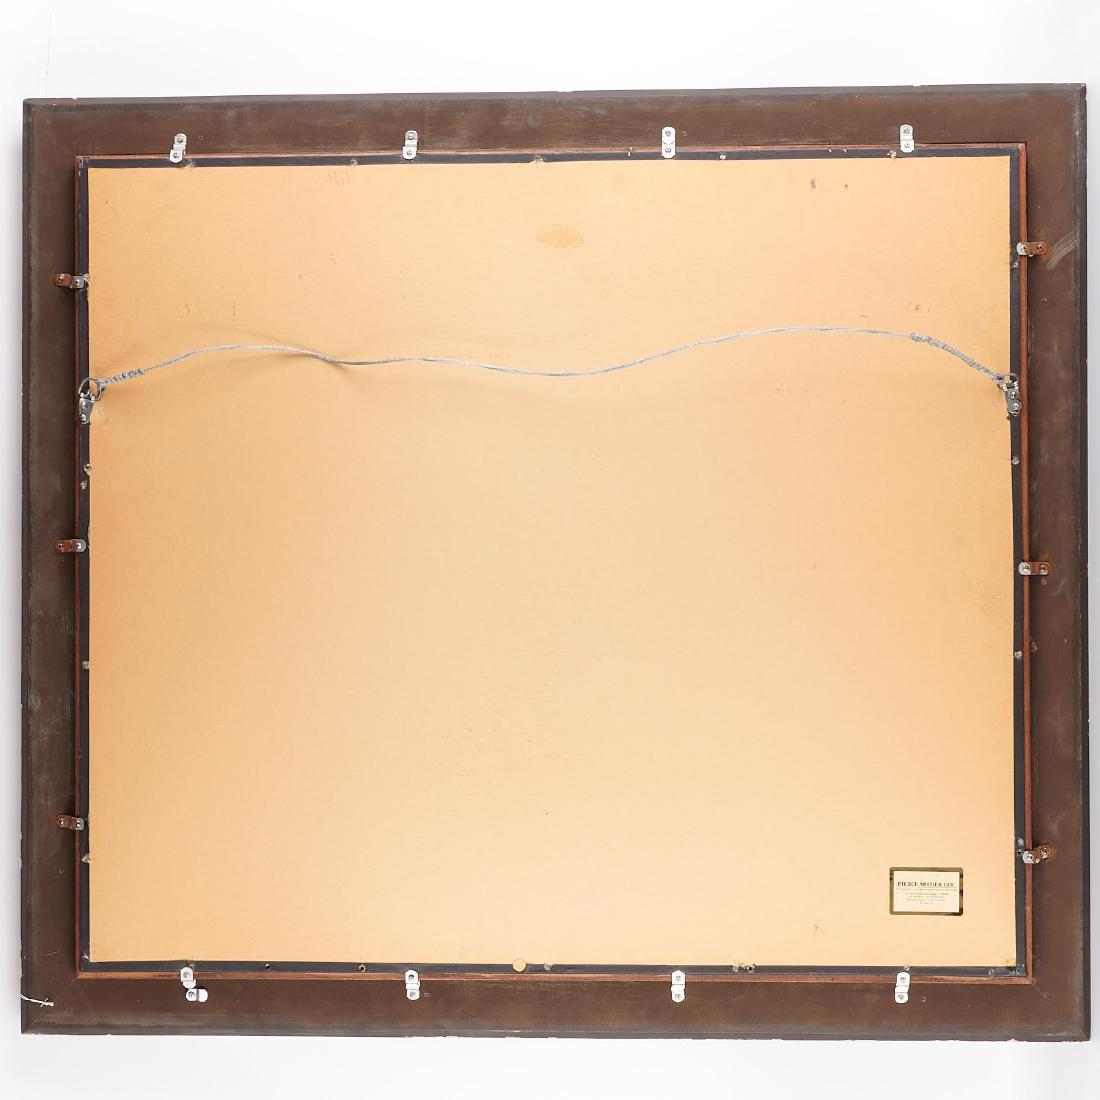 Early Chinese framed coromandel panel - 8